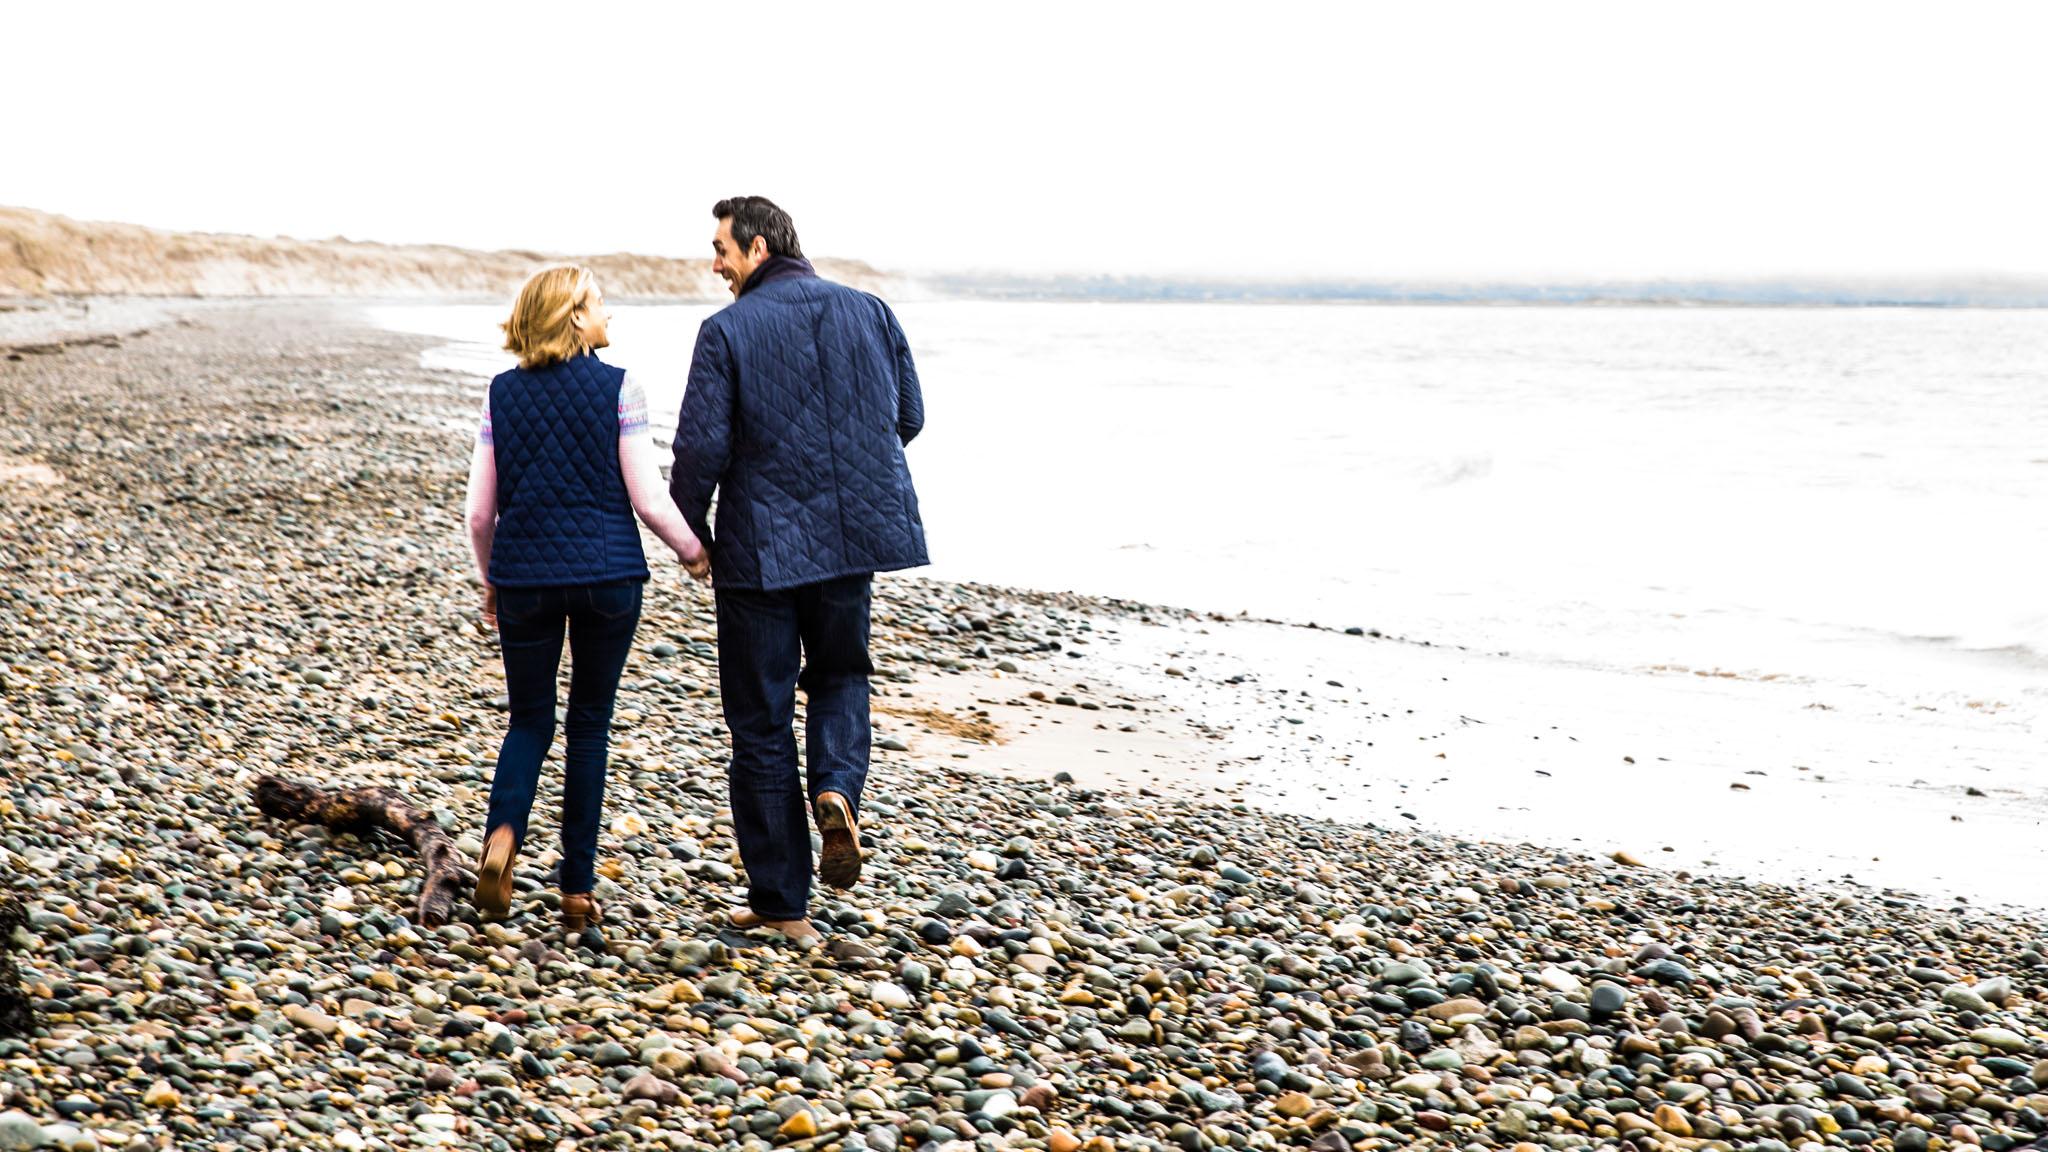 Prewedding shoot Newborough Beach, Anglesey by Cheshire wedding photographer Andrew Collier Photography